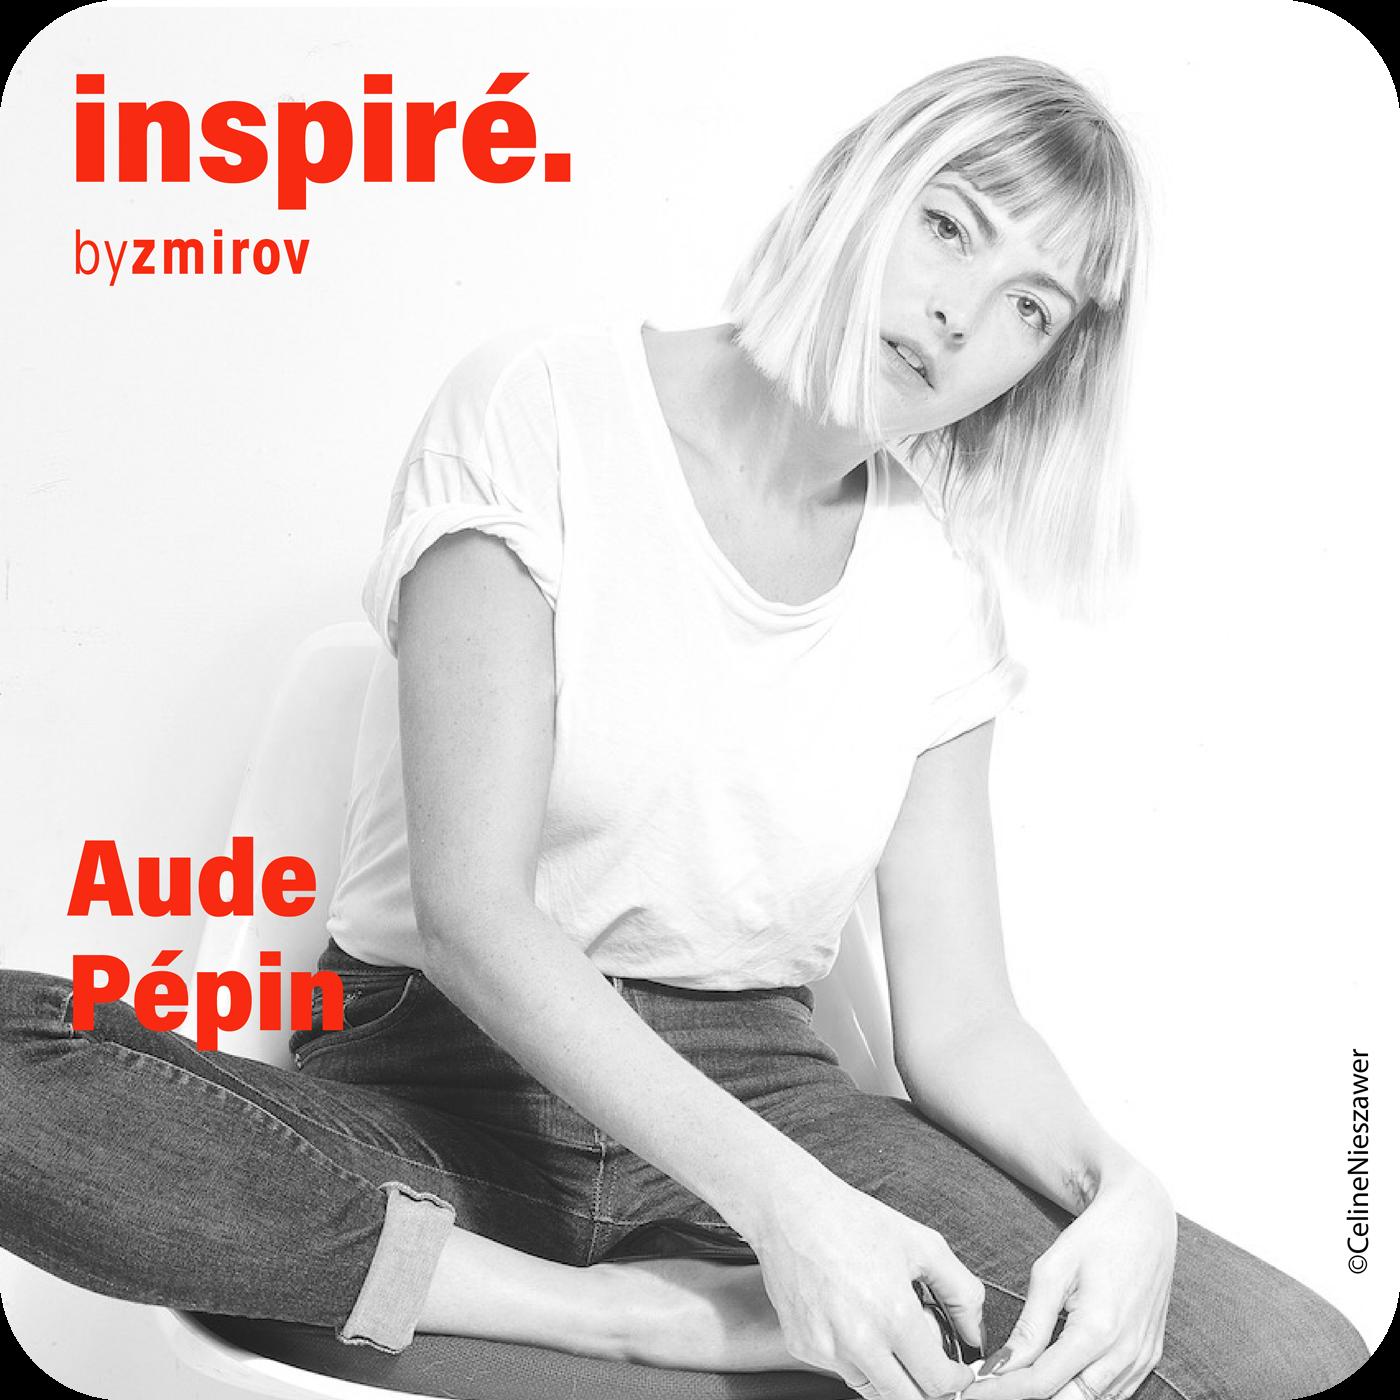 Aude Pépin